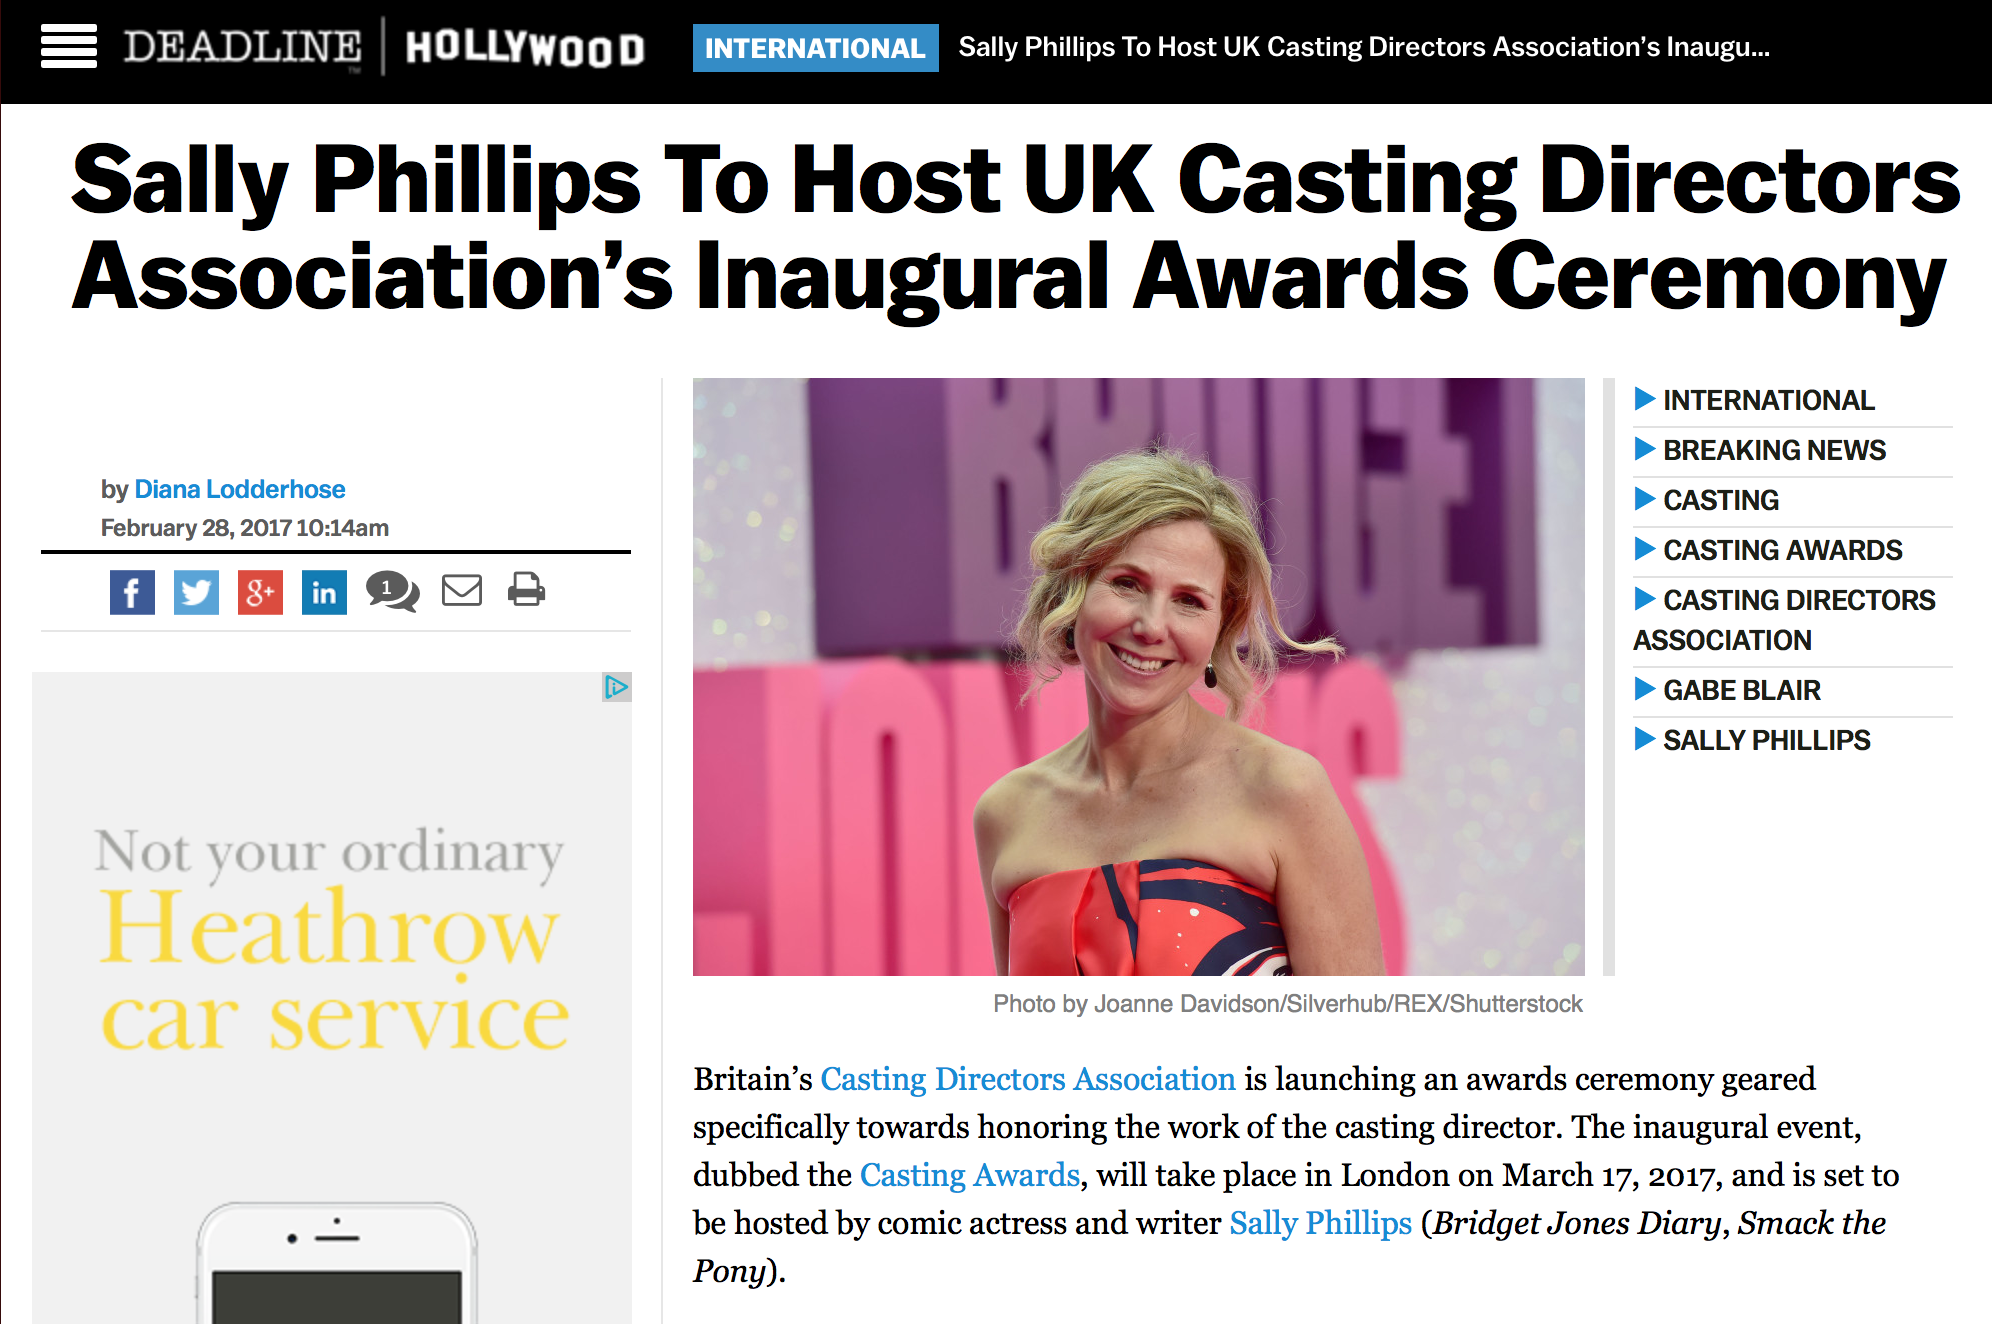 CDA Awards - Nominees Announcement –Deadline Hollywood